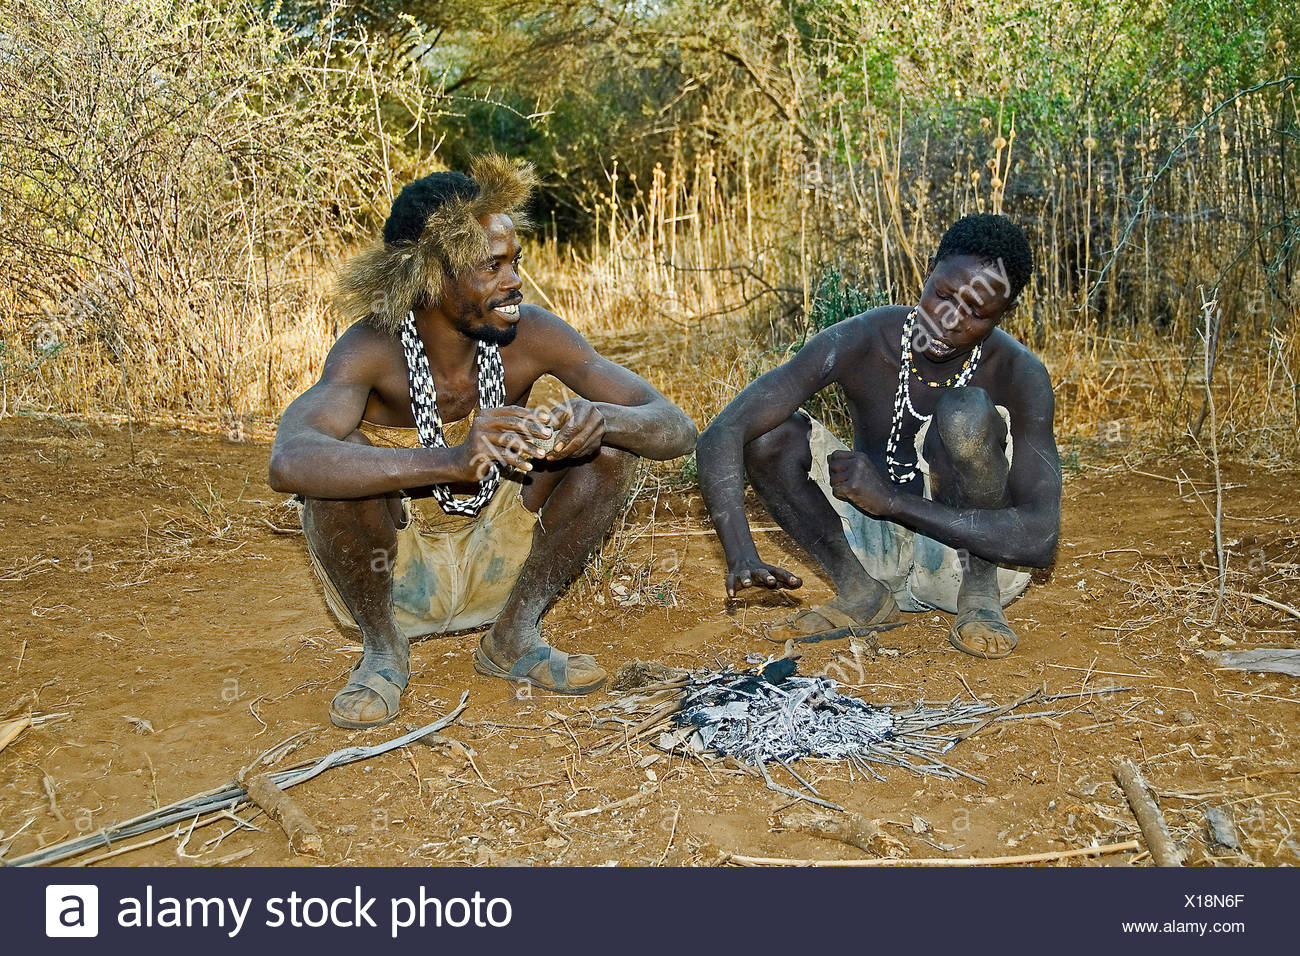 two Hadzabe bushmen at the fireplace, Tanzania, Lake Eyasi, Serengeti - Stock Image